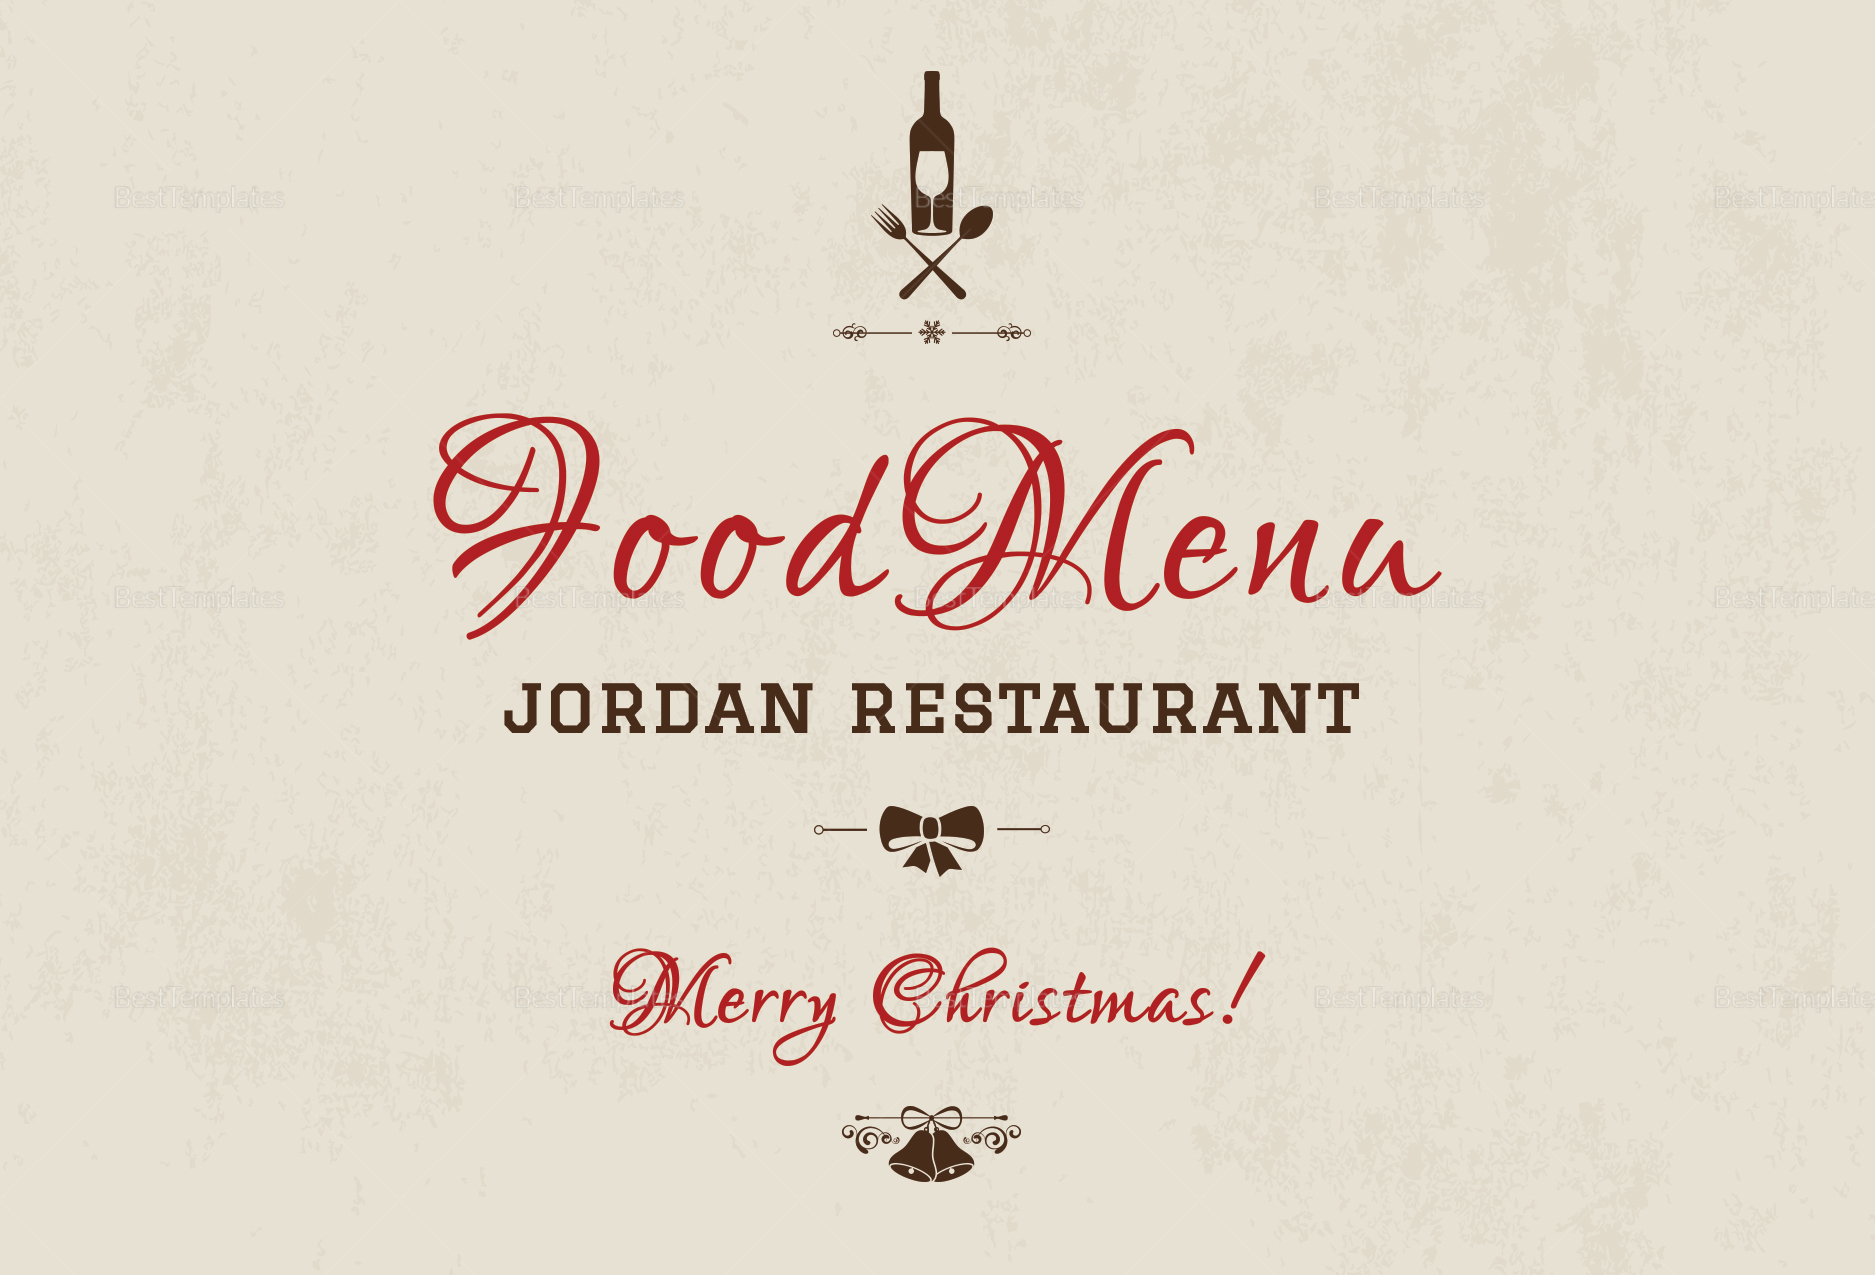 Restaurant Christmas Thank You Card